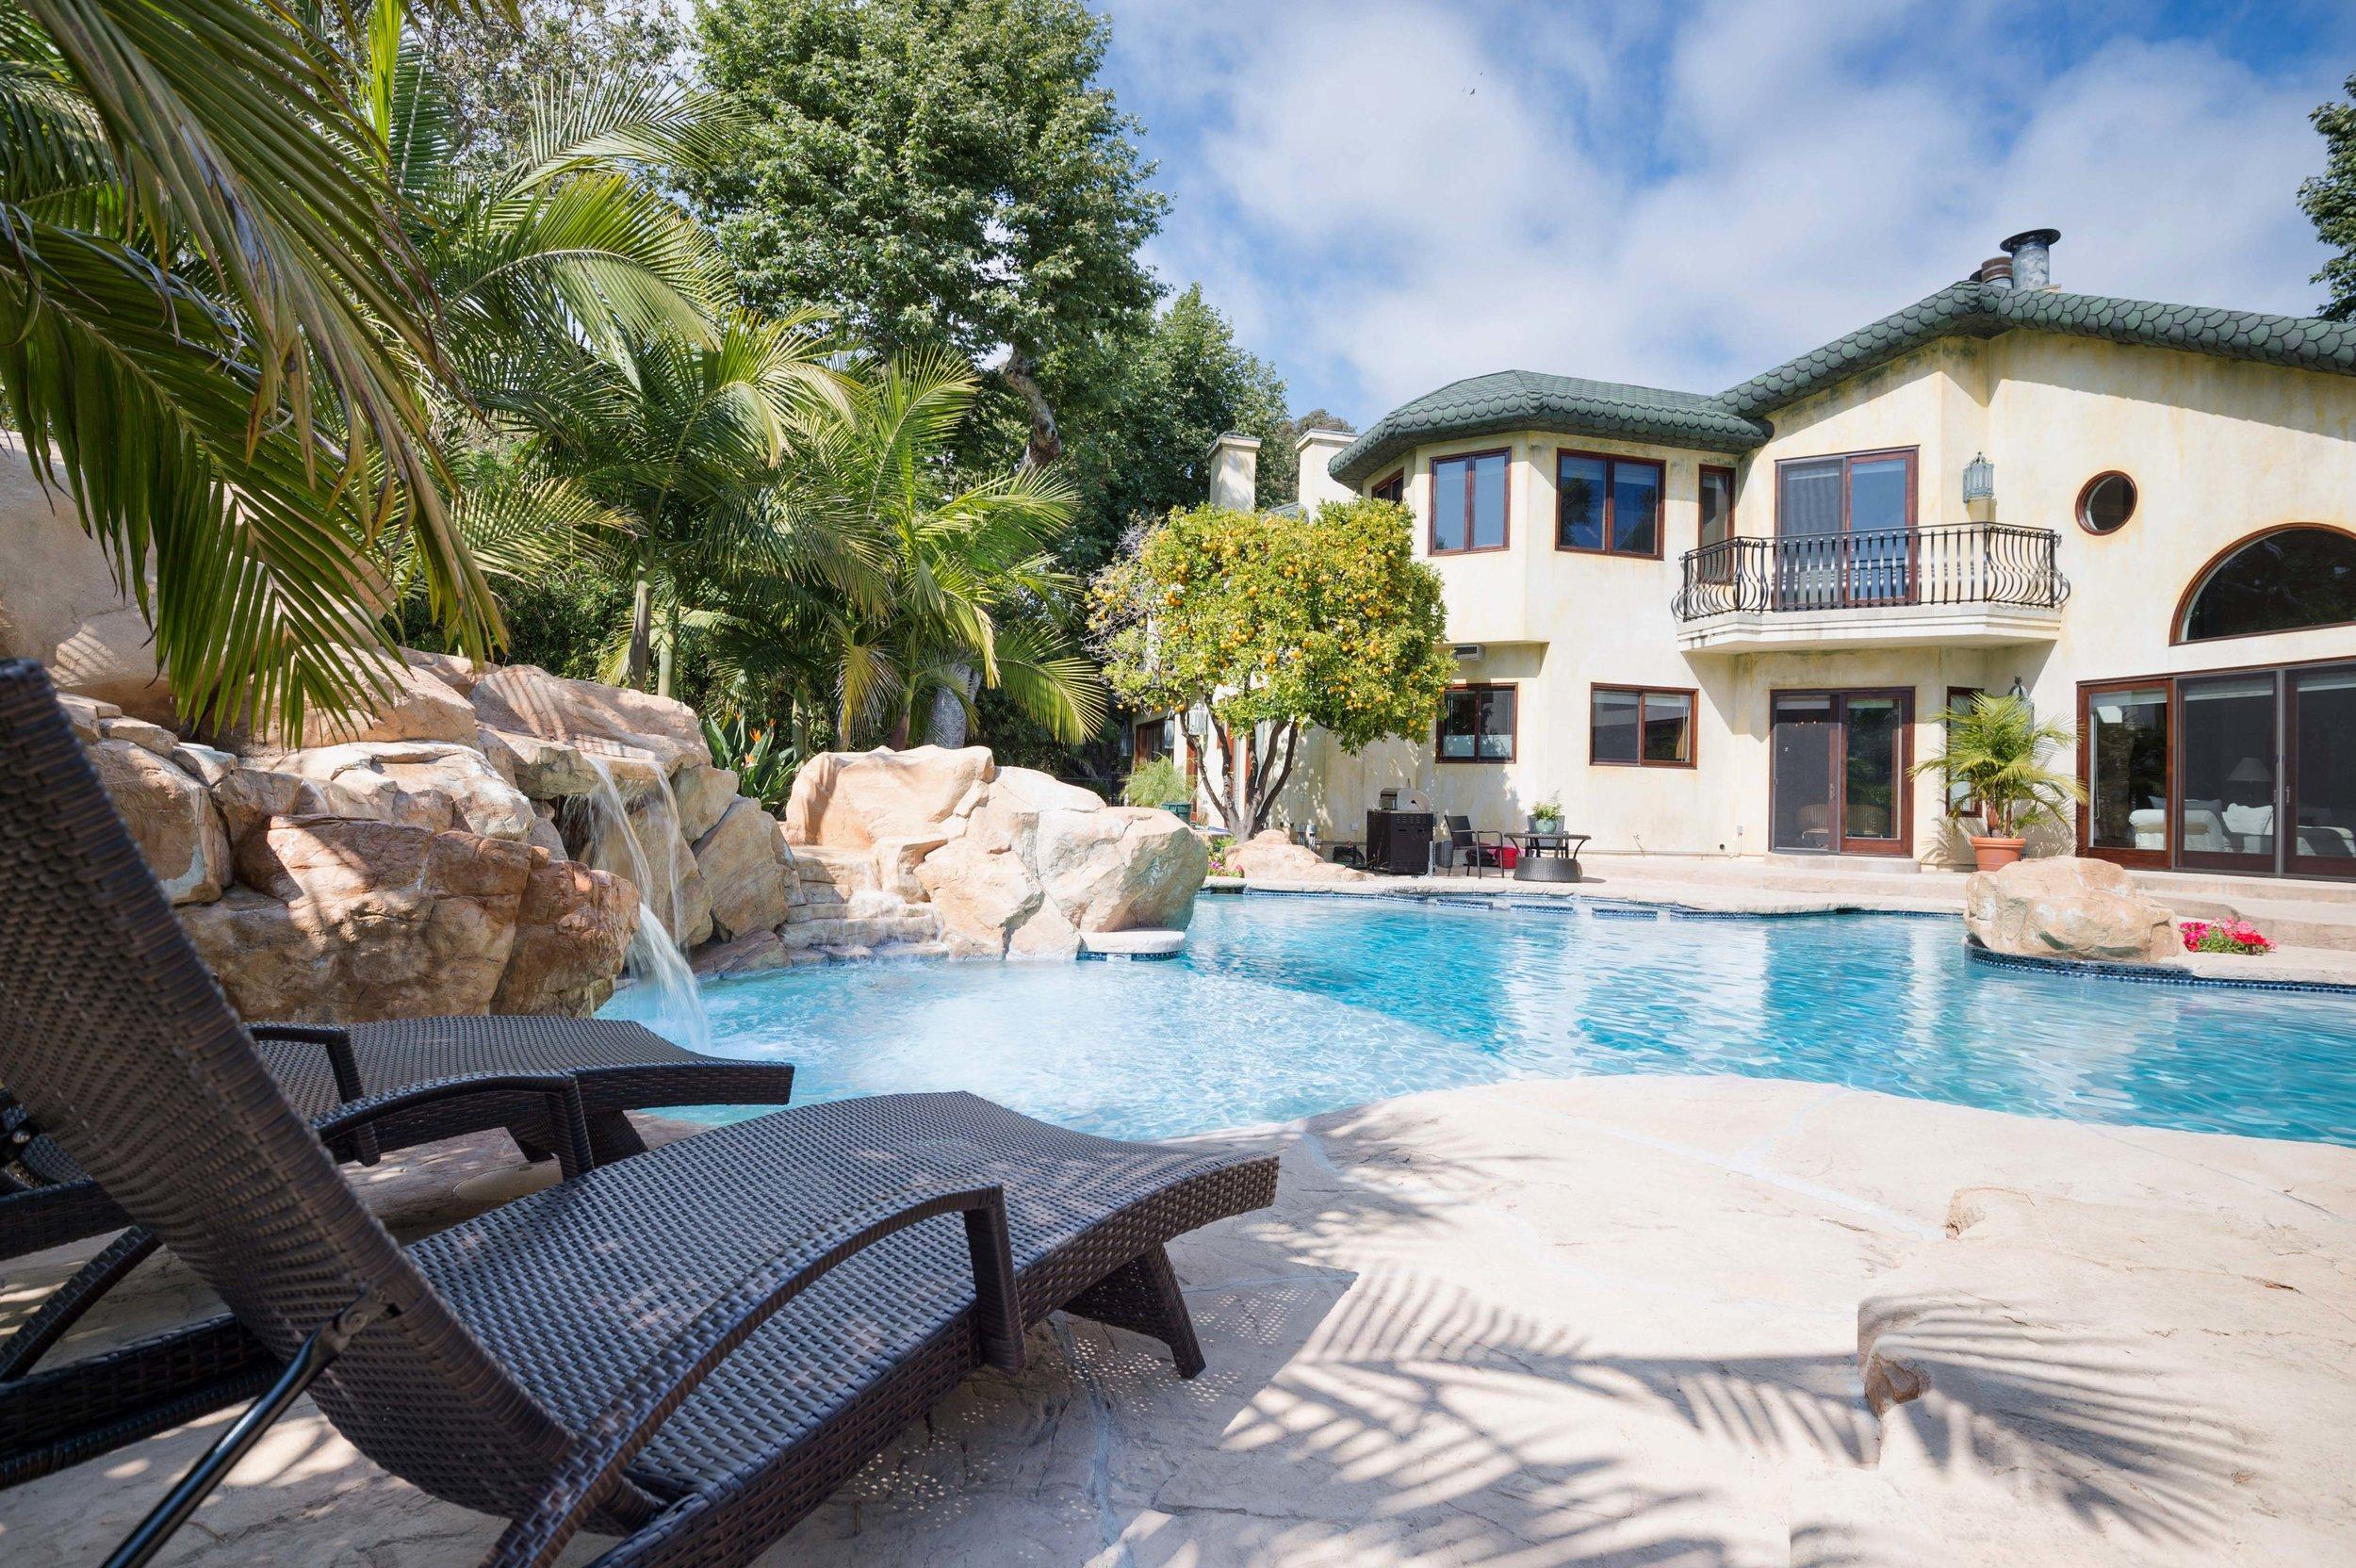 028 pool 6405 bonsall Malibu For Sale The Malibu Life Team Luxury Real Estate.jpg